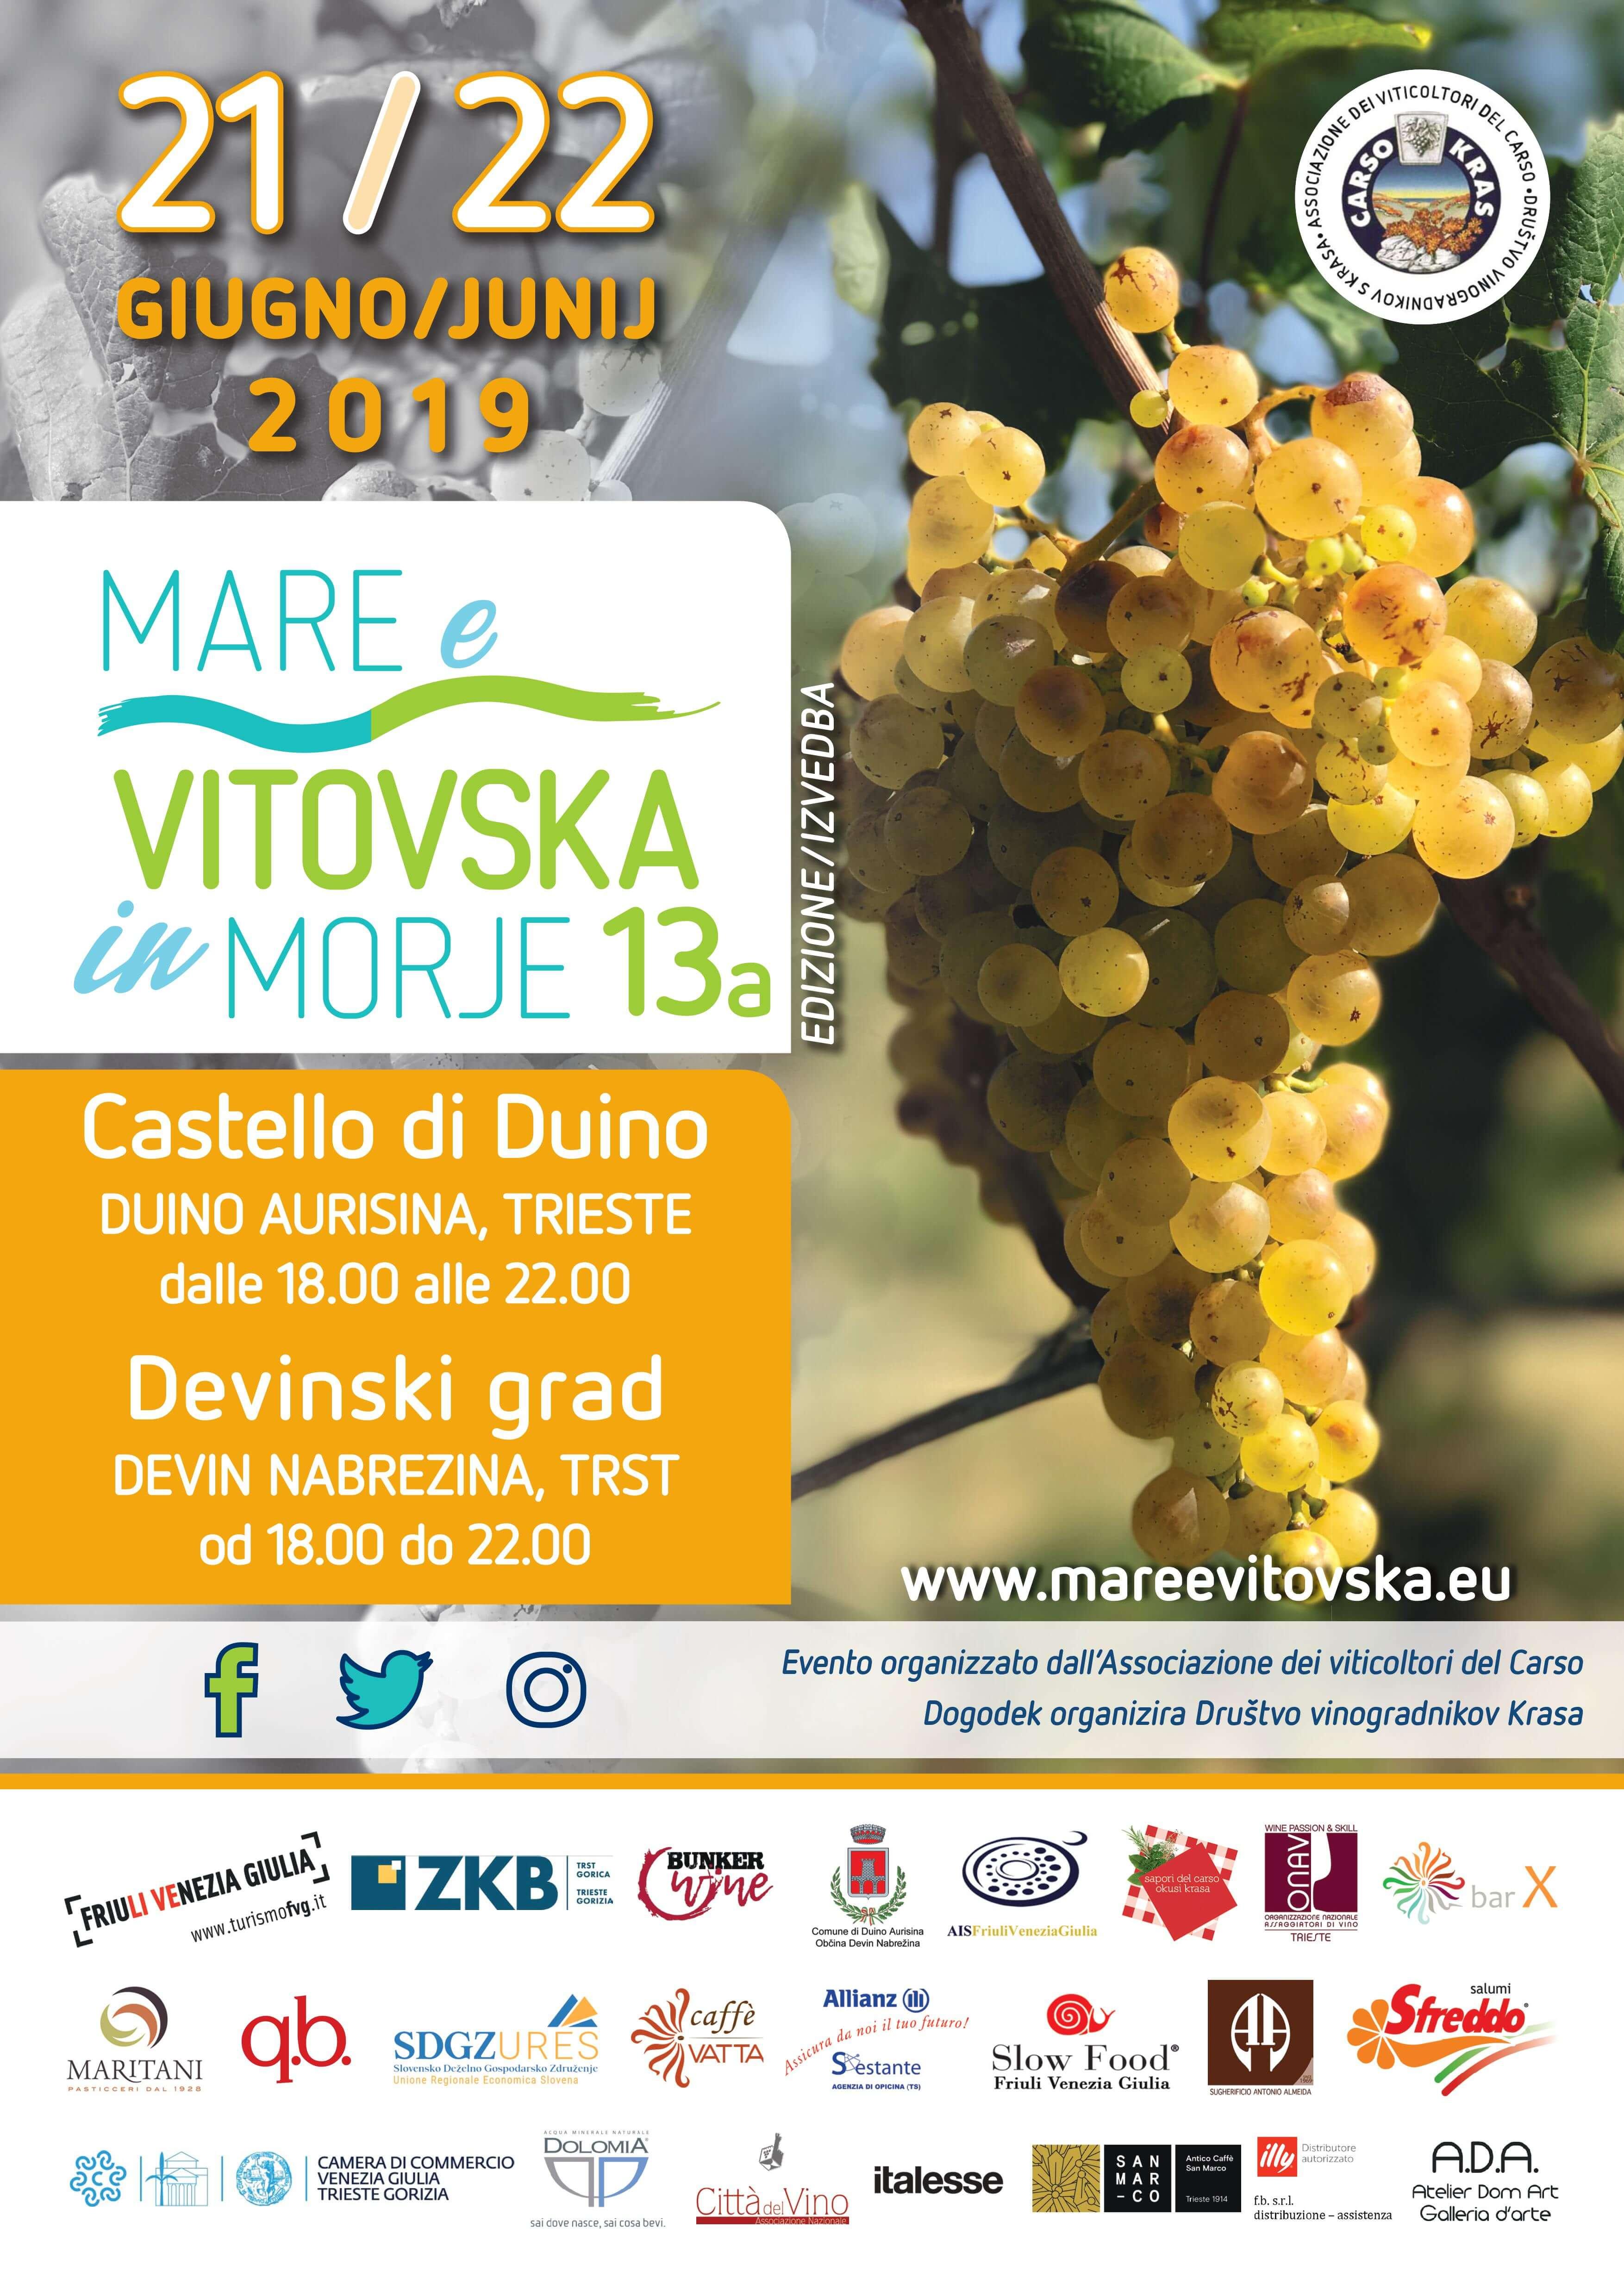 MM Vitovska 2019 depli